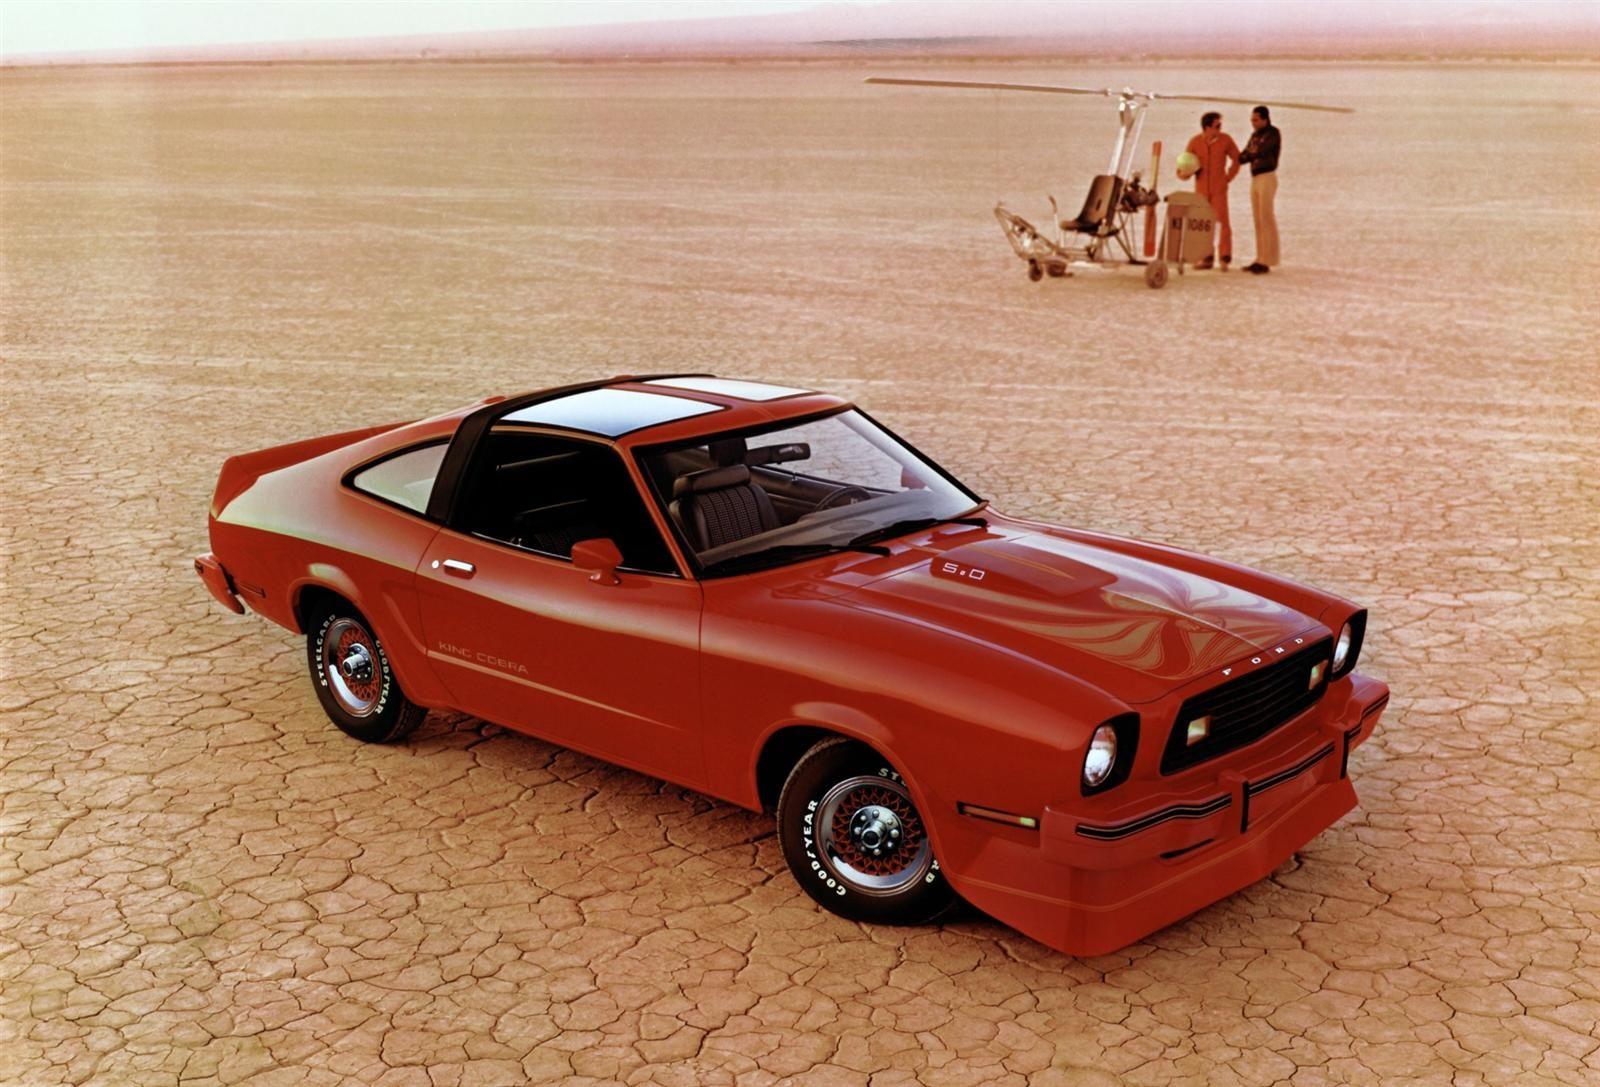 1978 Ford Mustang Ii King Cobra Ford Mustang Cobra Mustang Ii Mustang Cobra